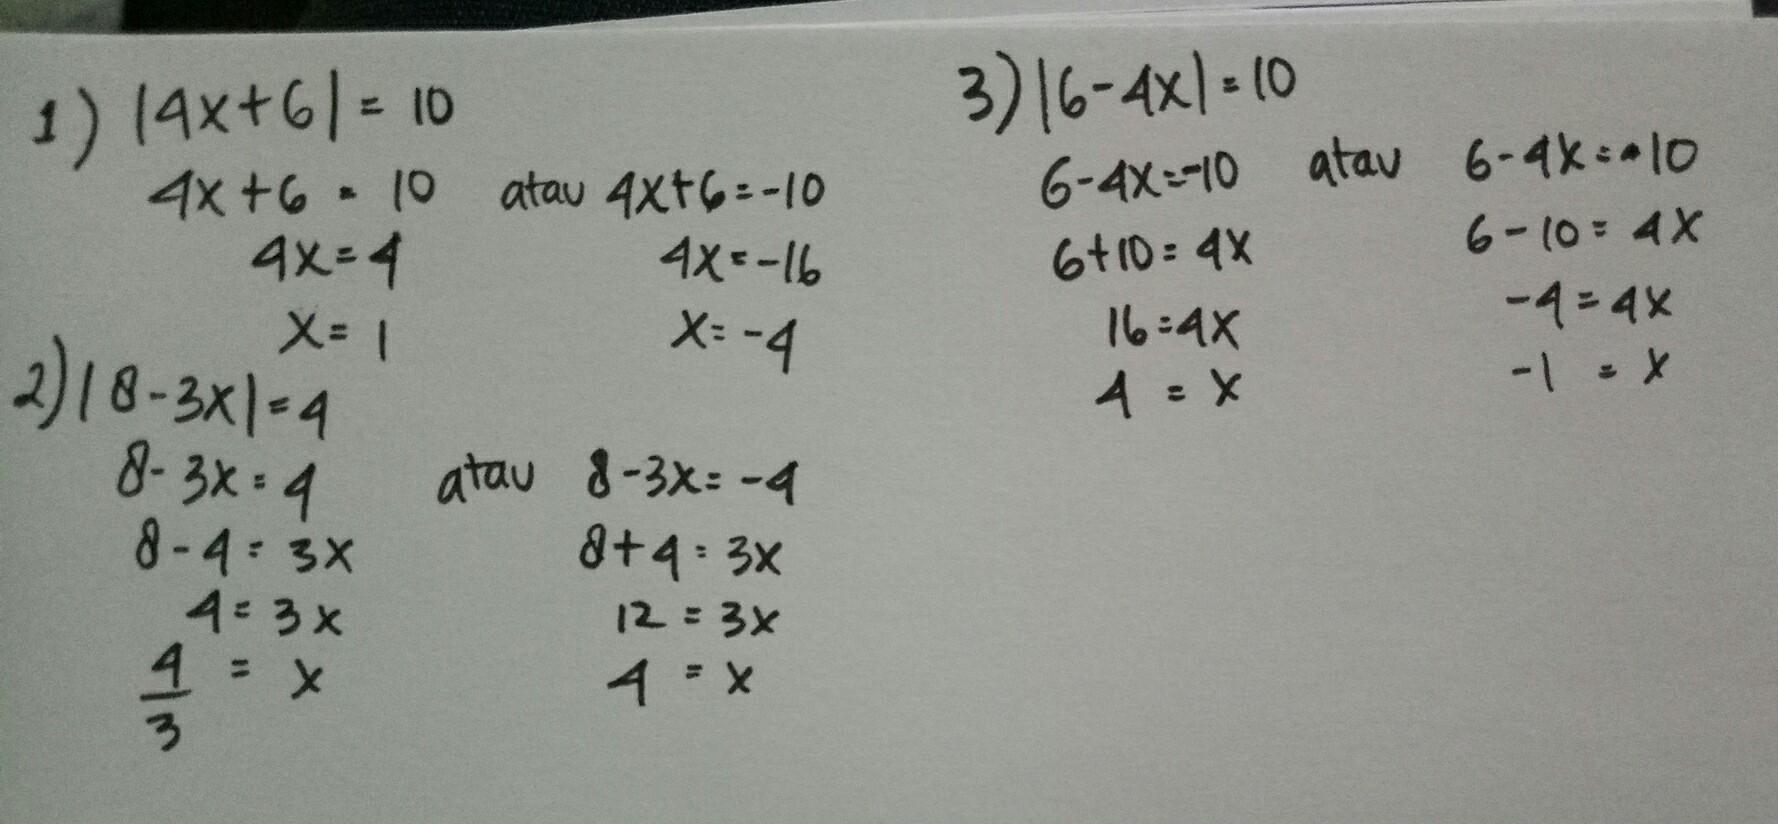 Carilah Nilai X Yang Memenuhi Setiap Persamaan Nilai Mutlak Berikut Ini 1 4x 6 10 2 Brainly Co Id